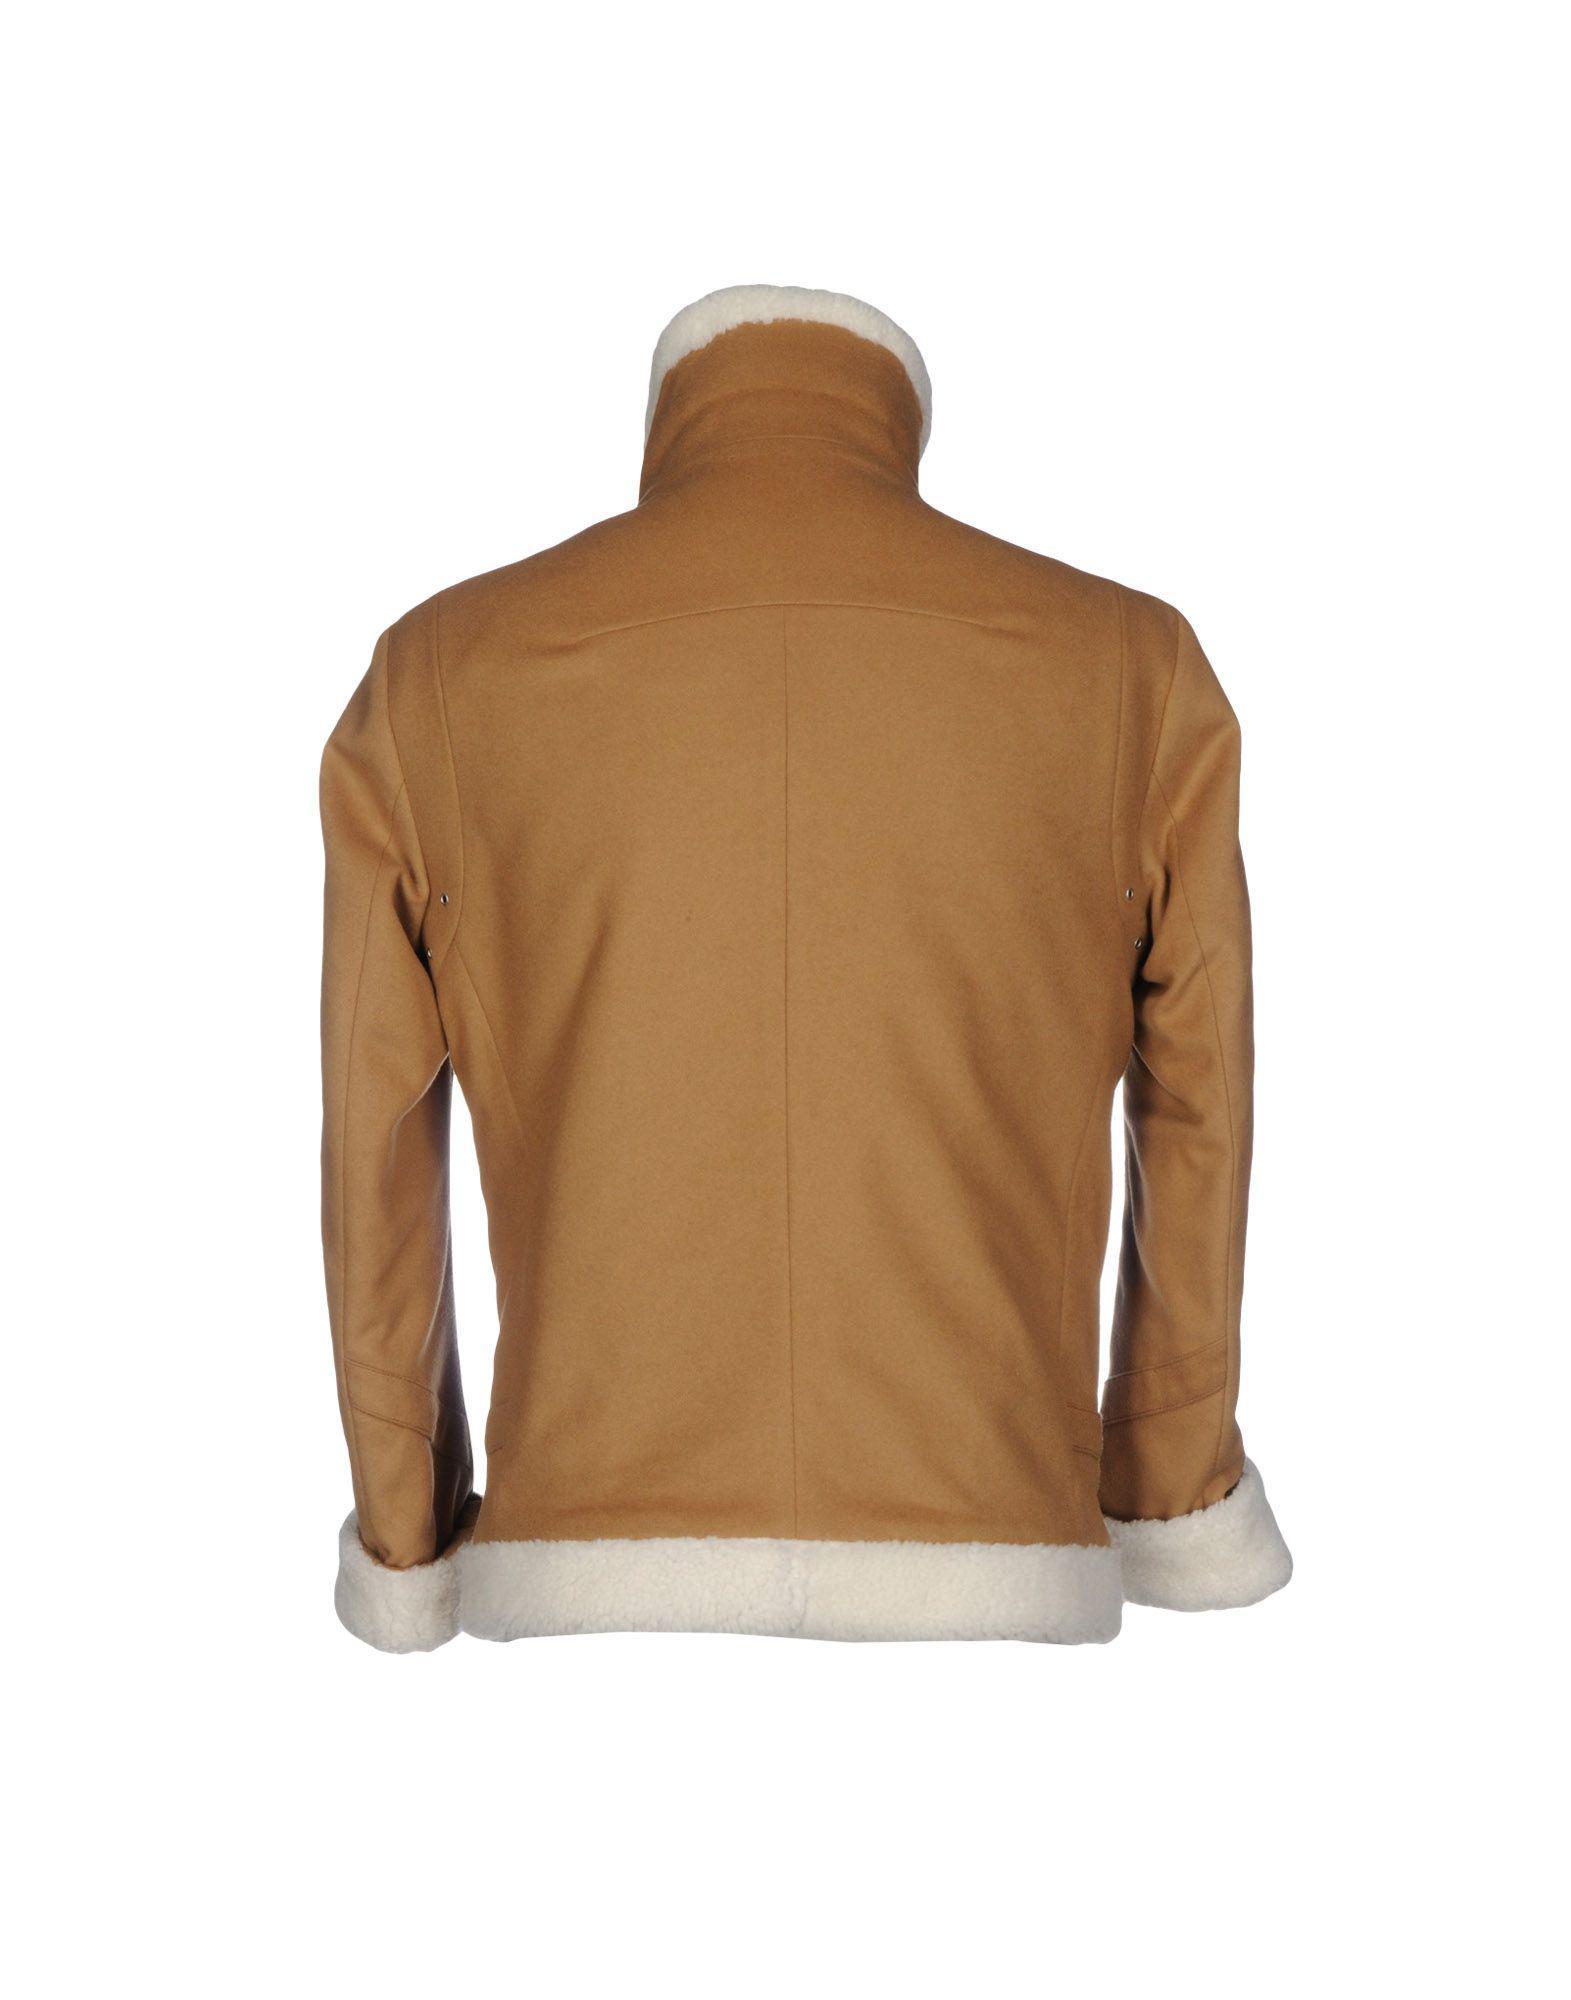 Billtornade Jacket in Camel (Brown) for Men